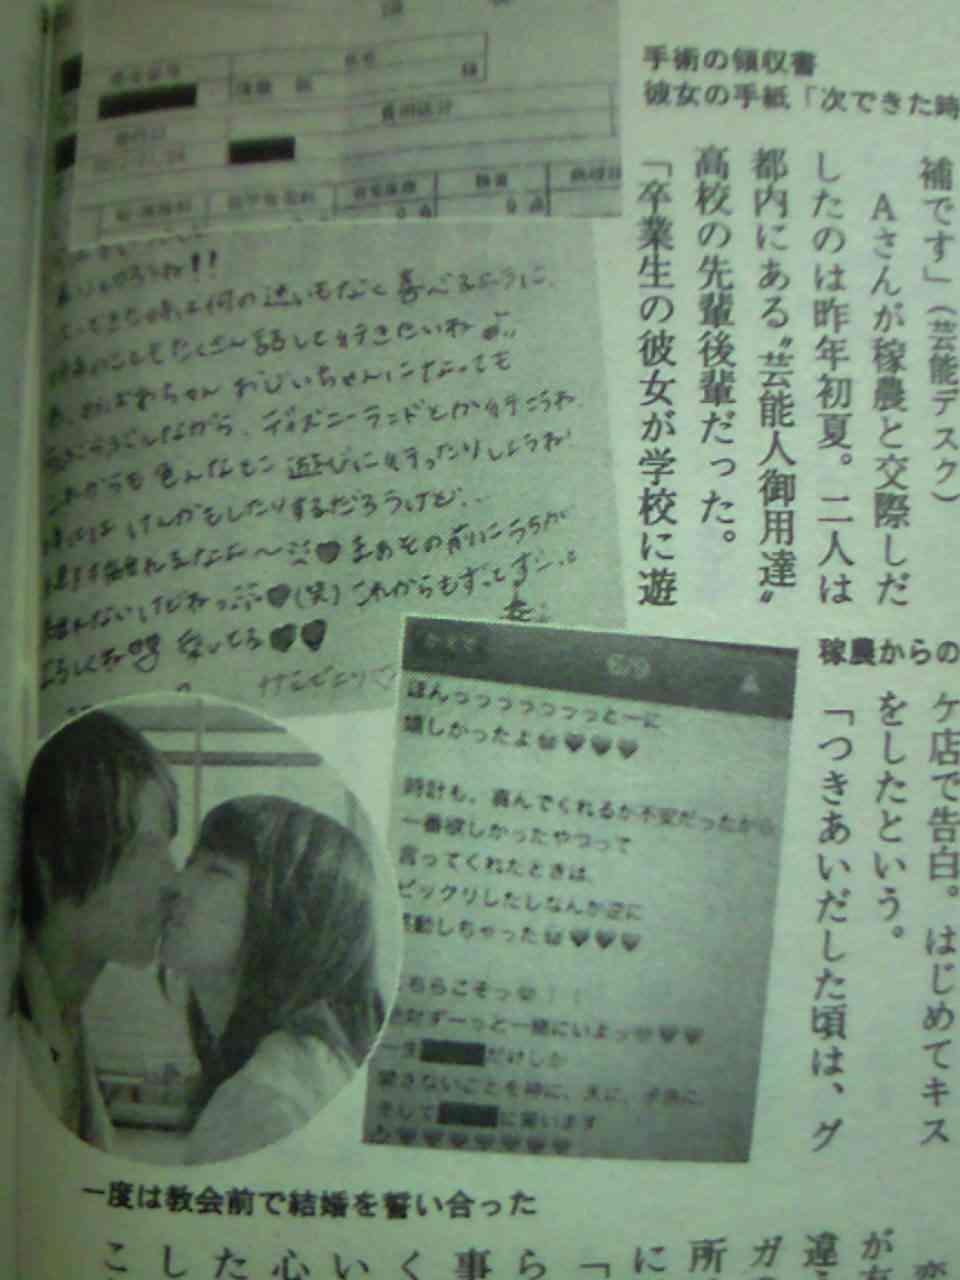 SUPER☆GiRLS・稼農楓が堕胎していた!元カレが妊娠・中絶を暴露